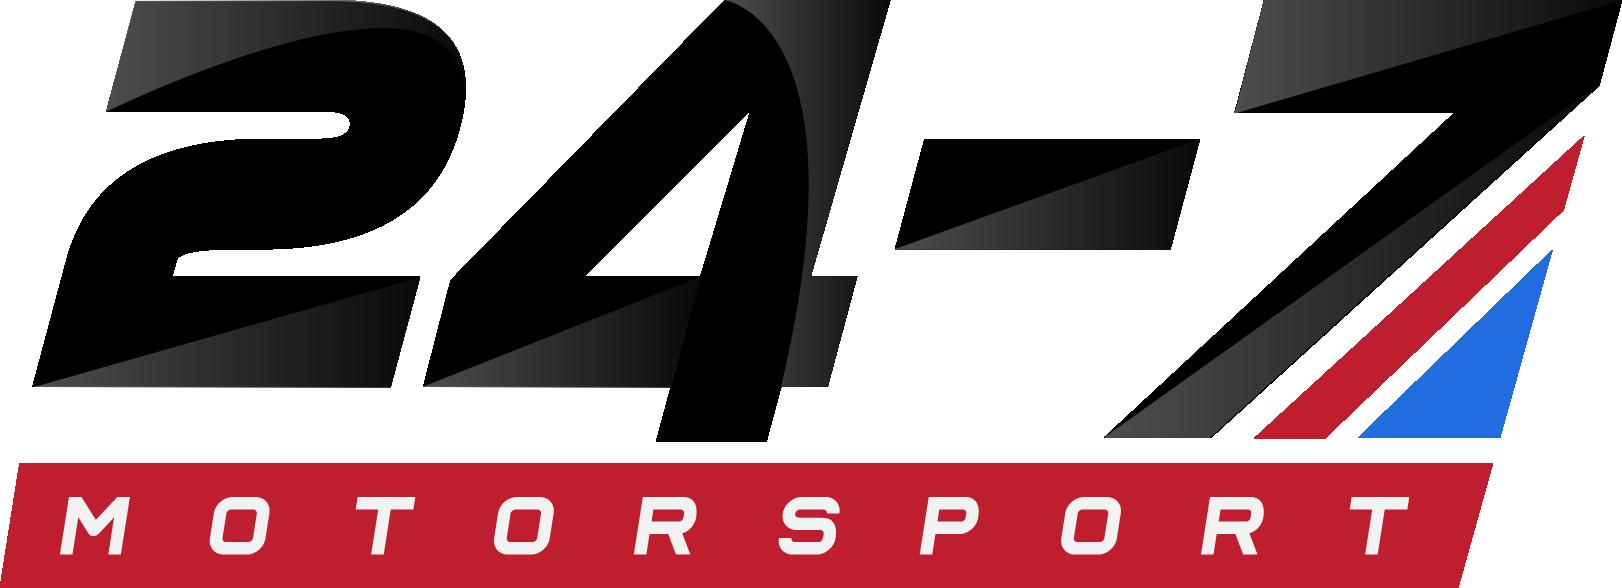 24-7 Motorsport